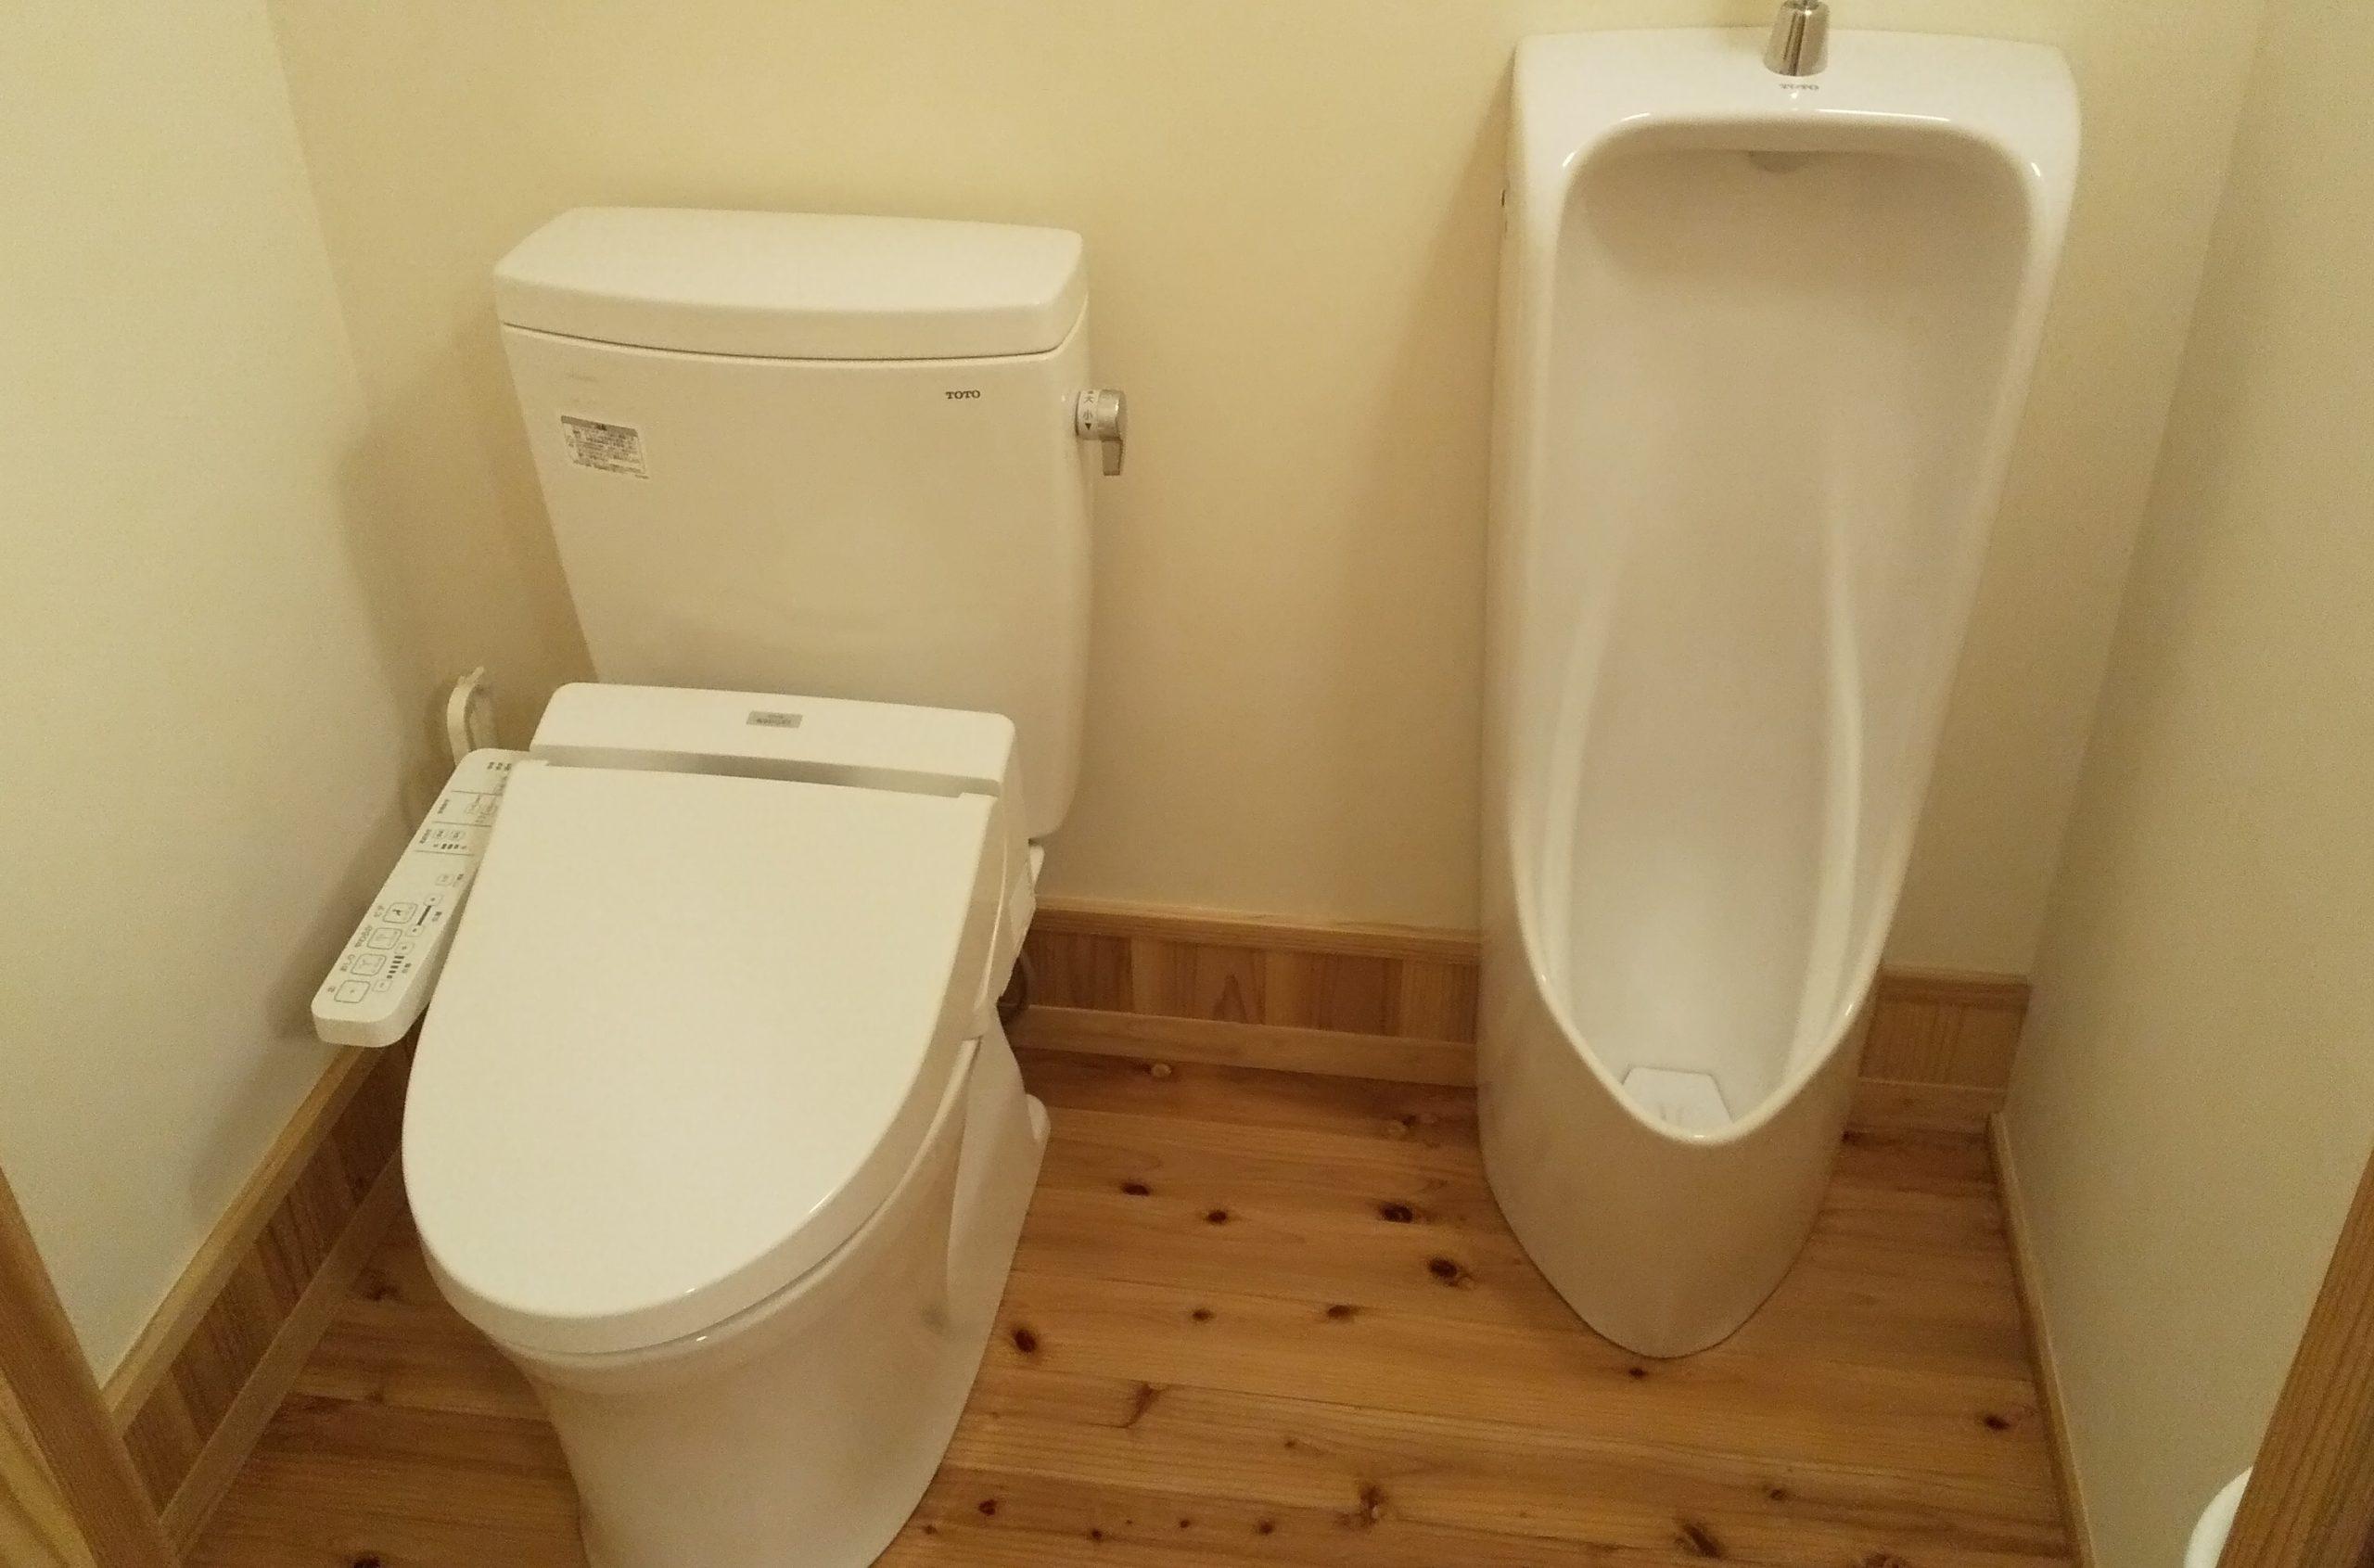 unisex restroom/男女共用トイレ